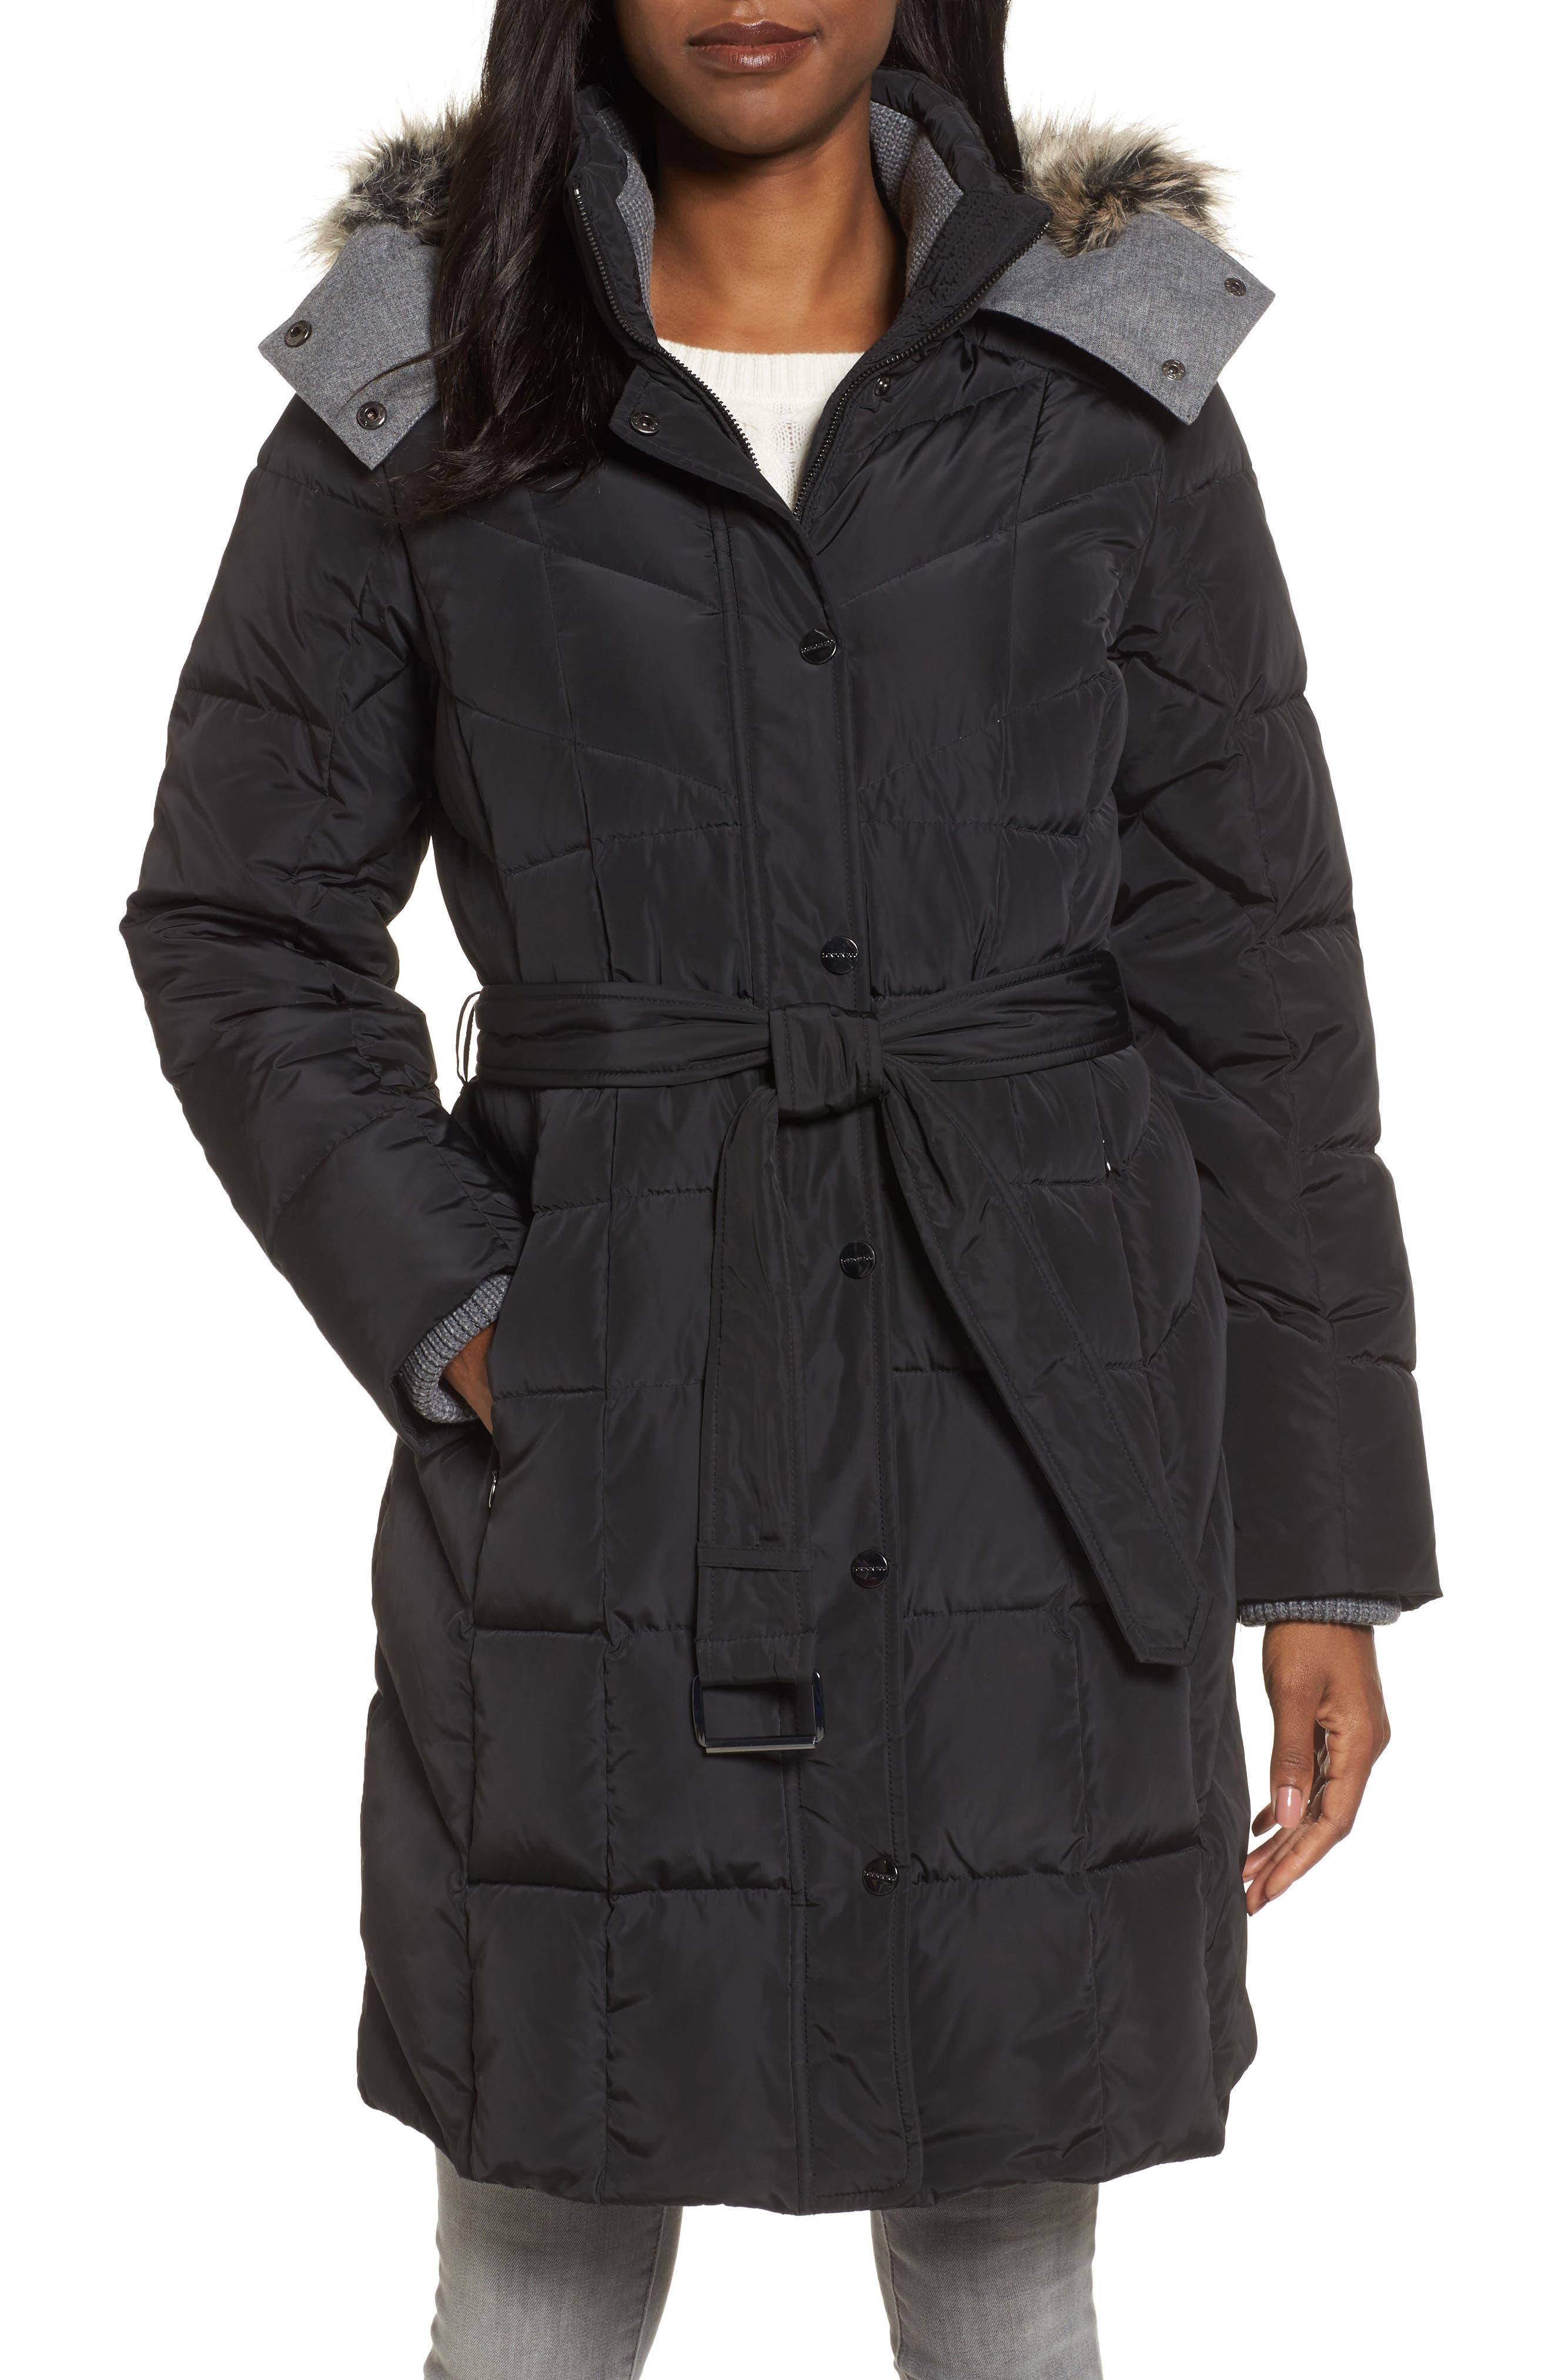 Alternate Image 1 Selected - London Fog Down Coat with Faux Fur Trim